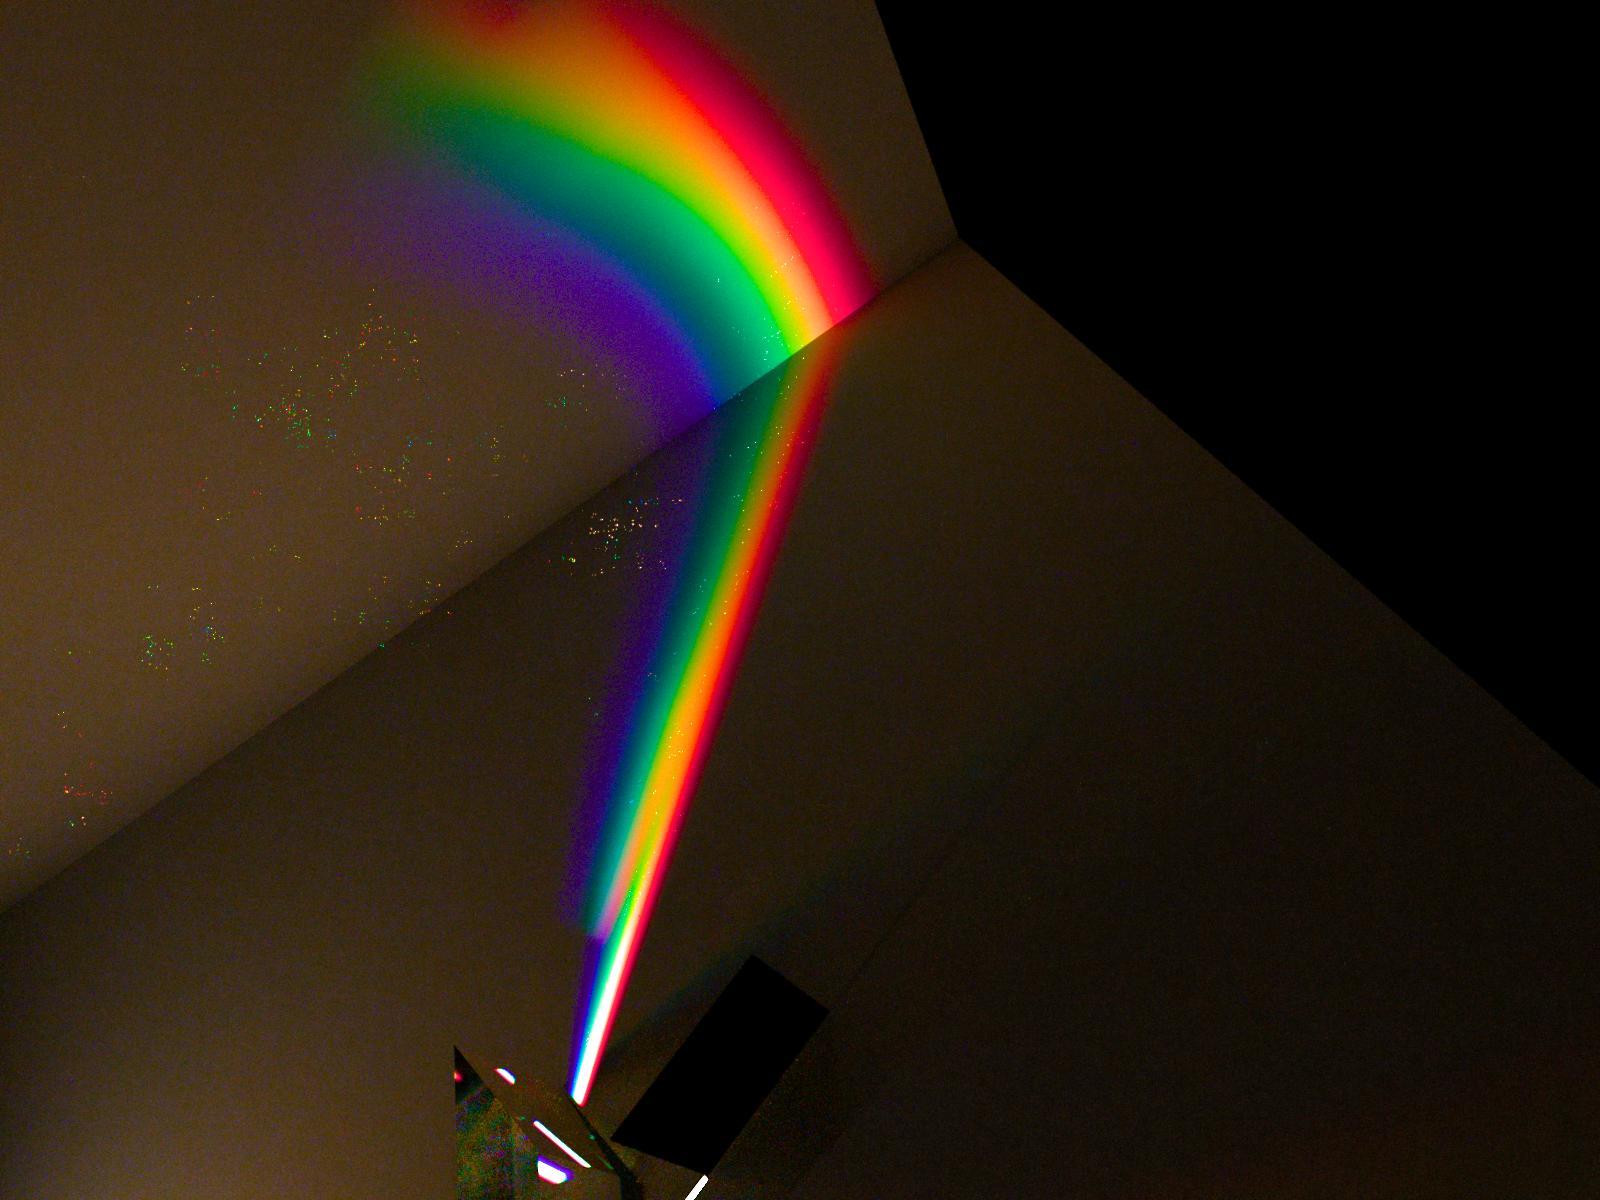 Dispercsion luz blanca con luxender prisma